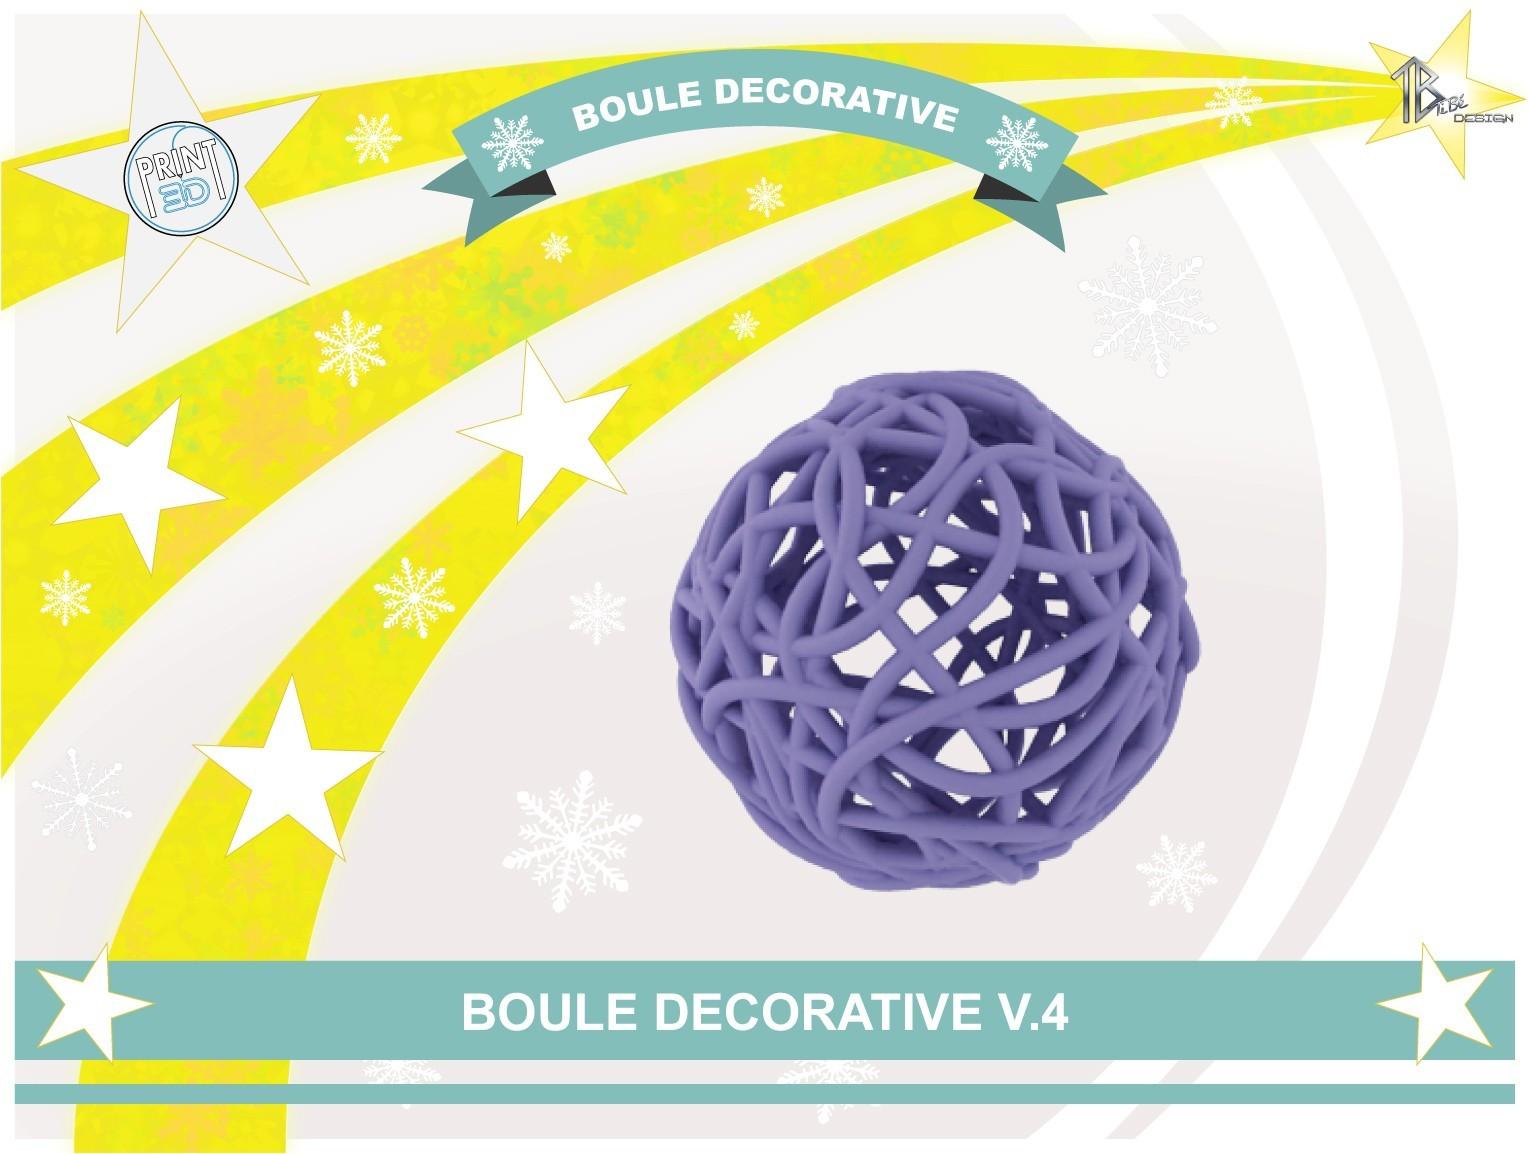 boule_deco_v4_def01.jpg Download free STL file Decorative ball V.4 • Design to 3D print, Tibe-Design